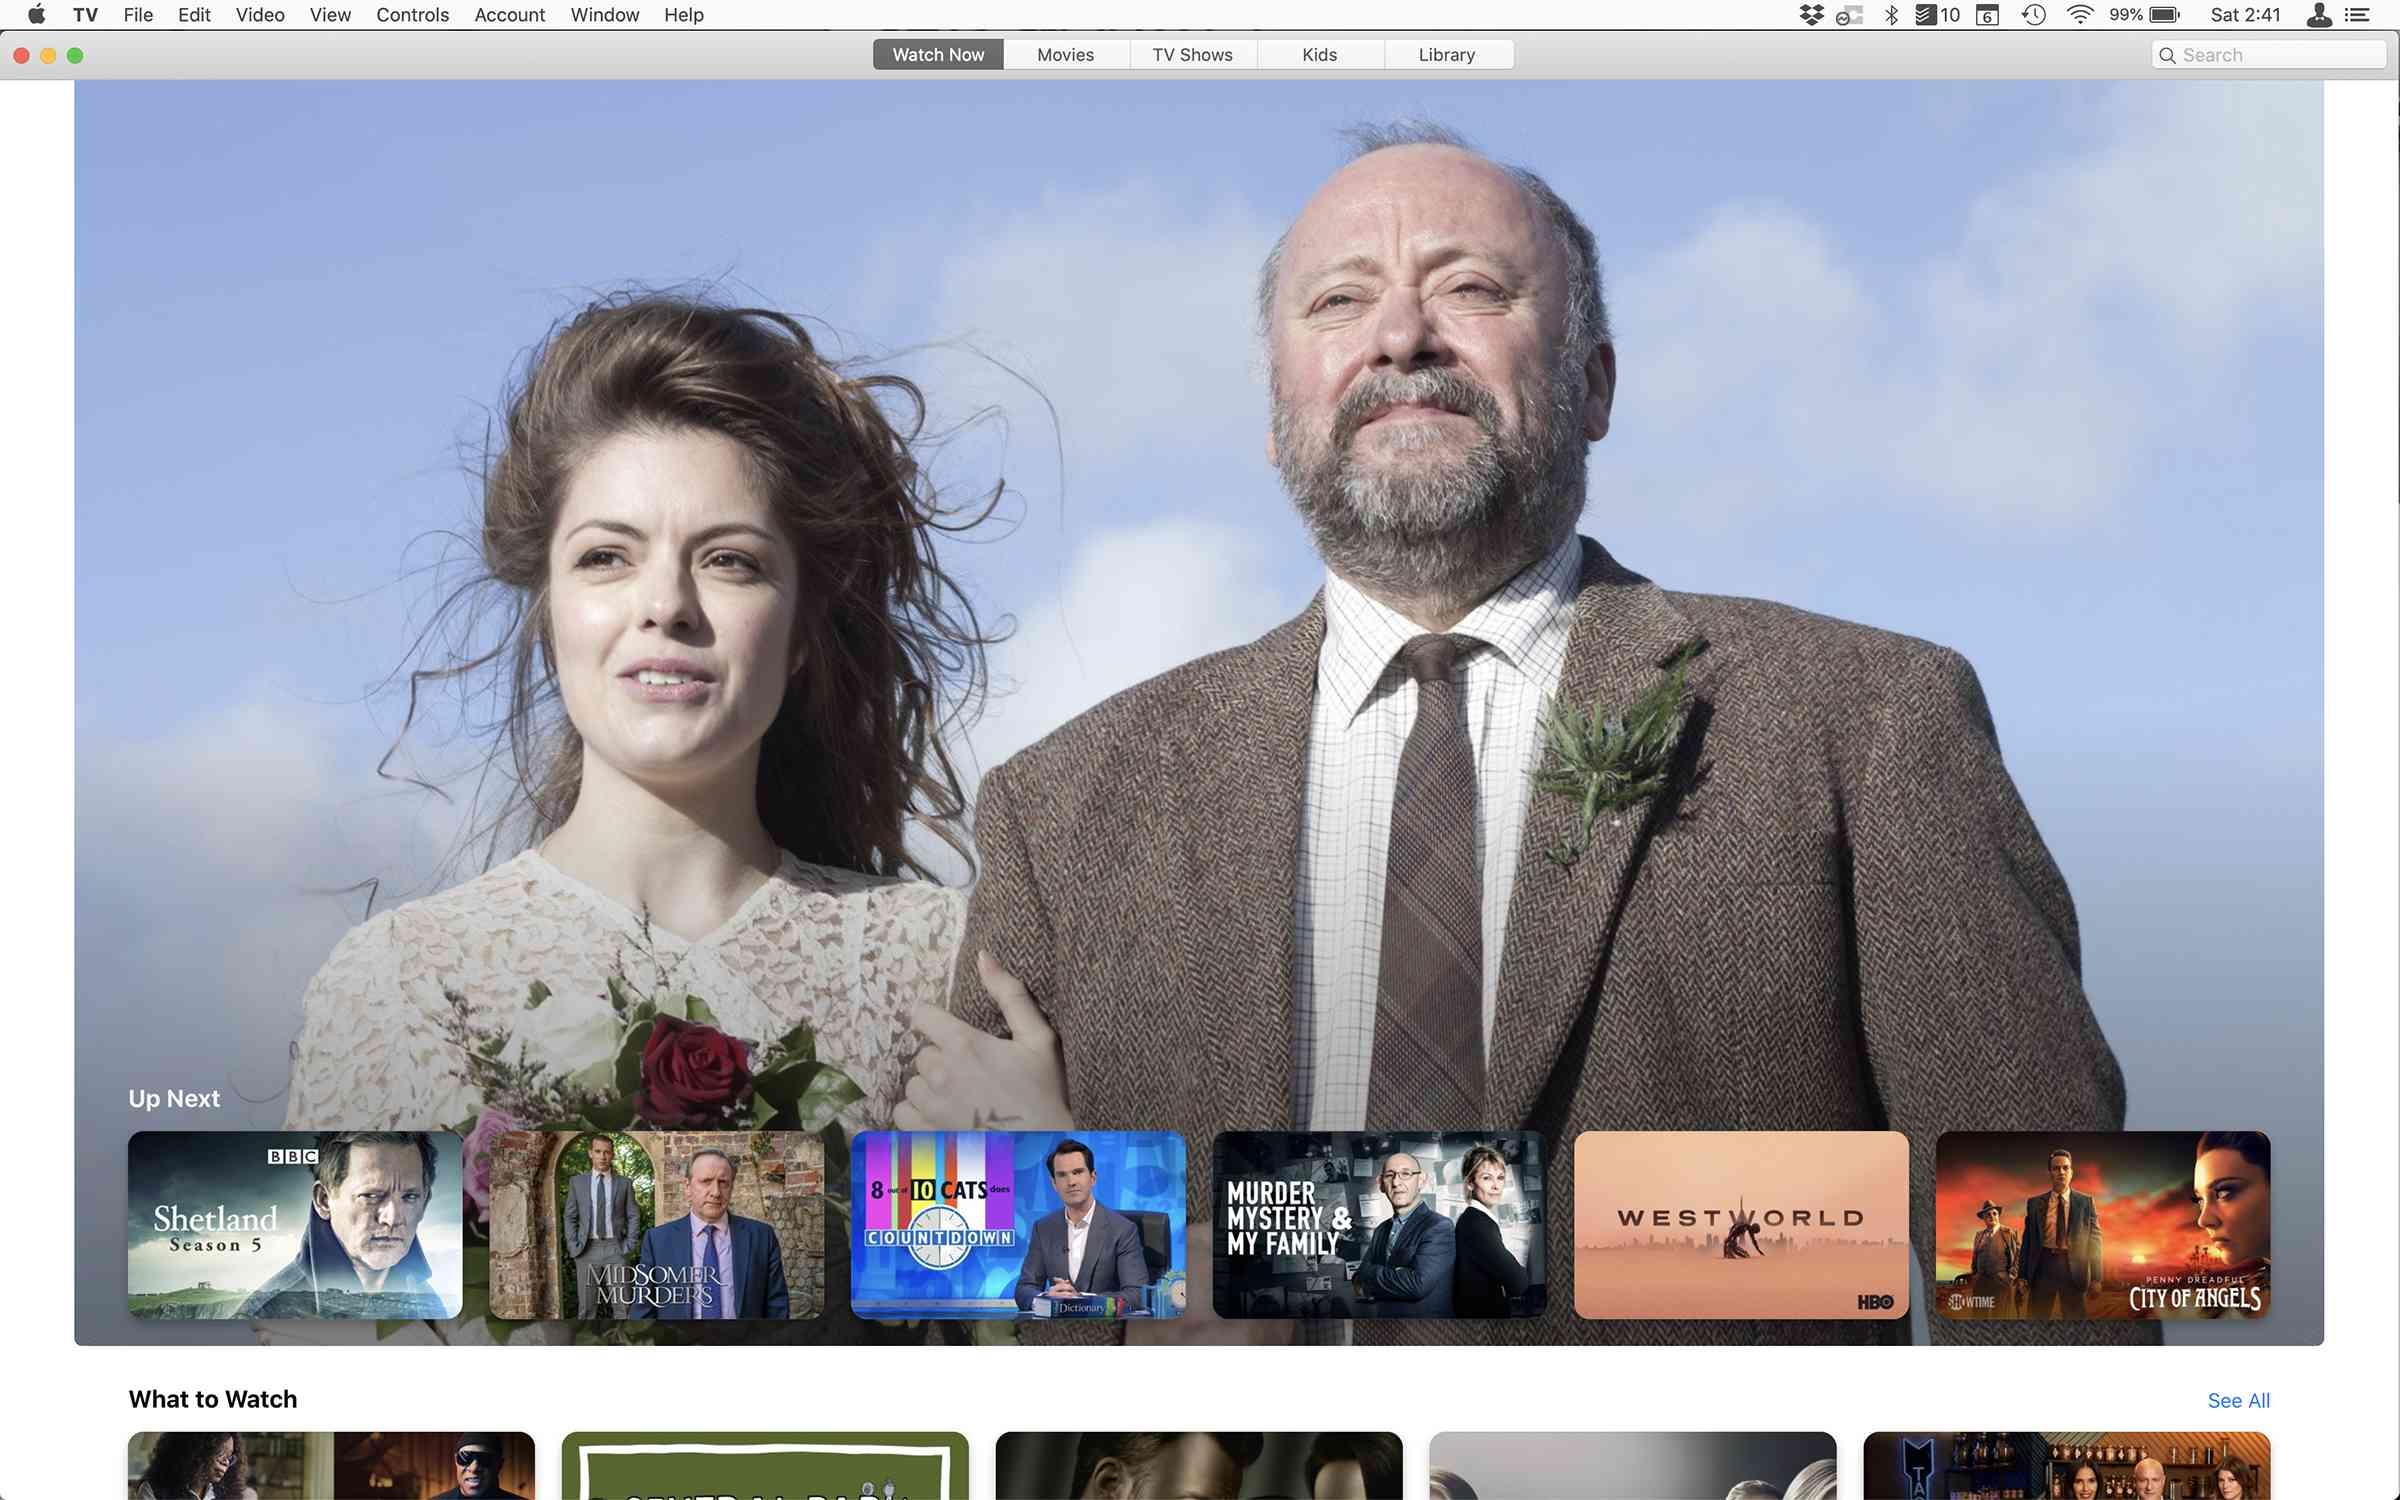 screenshot of the Apple TV app on Mac